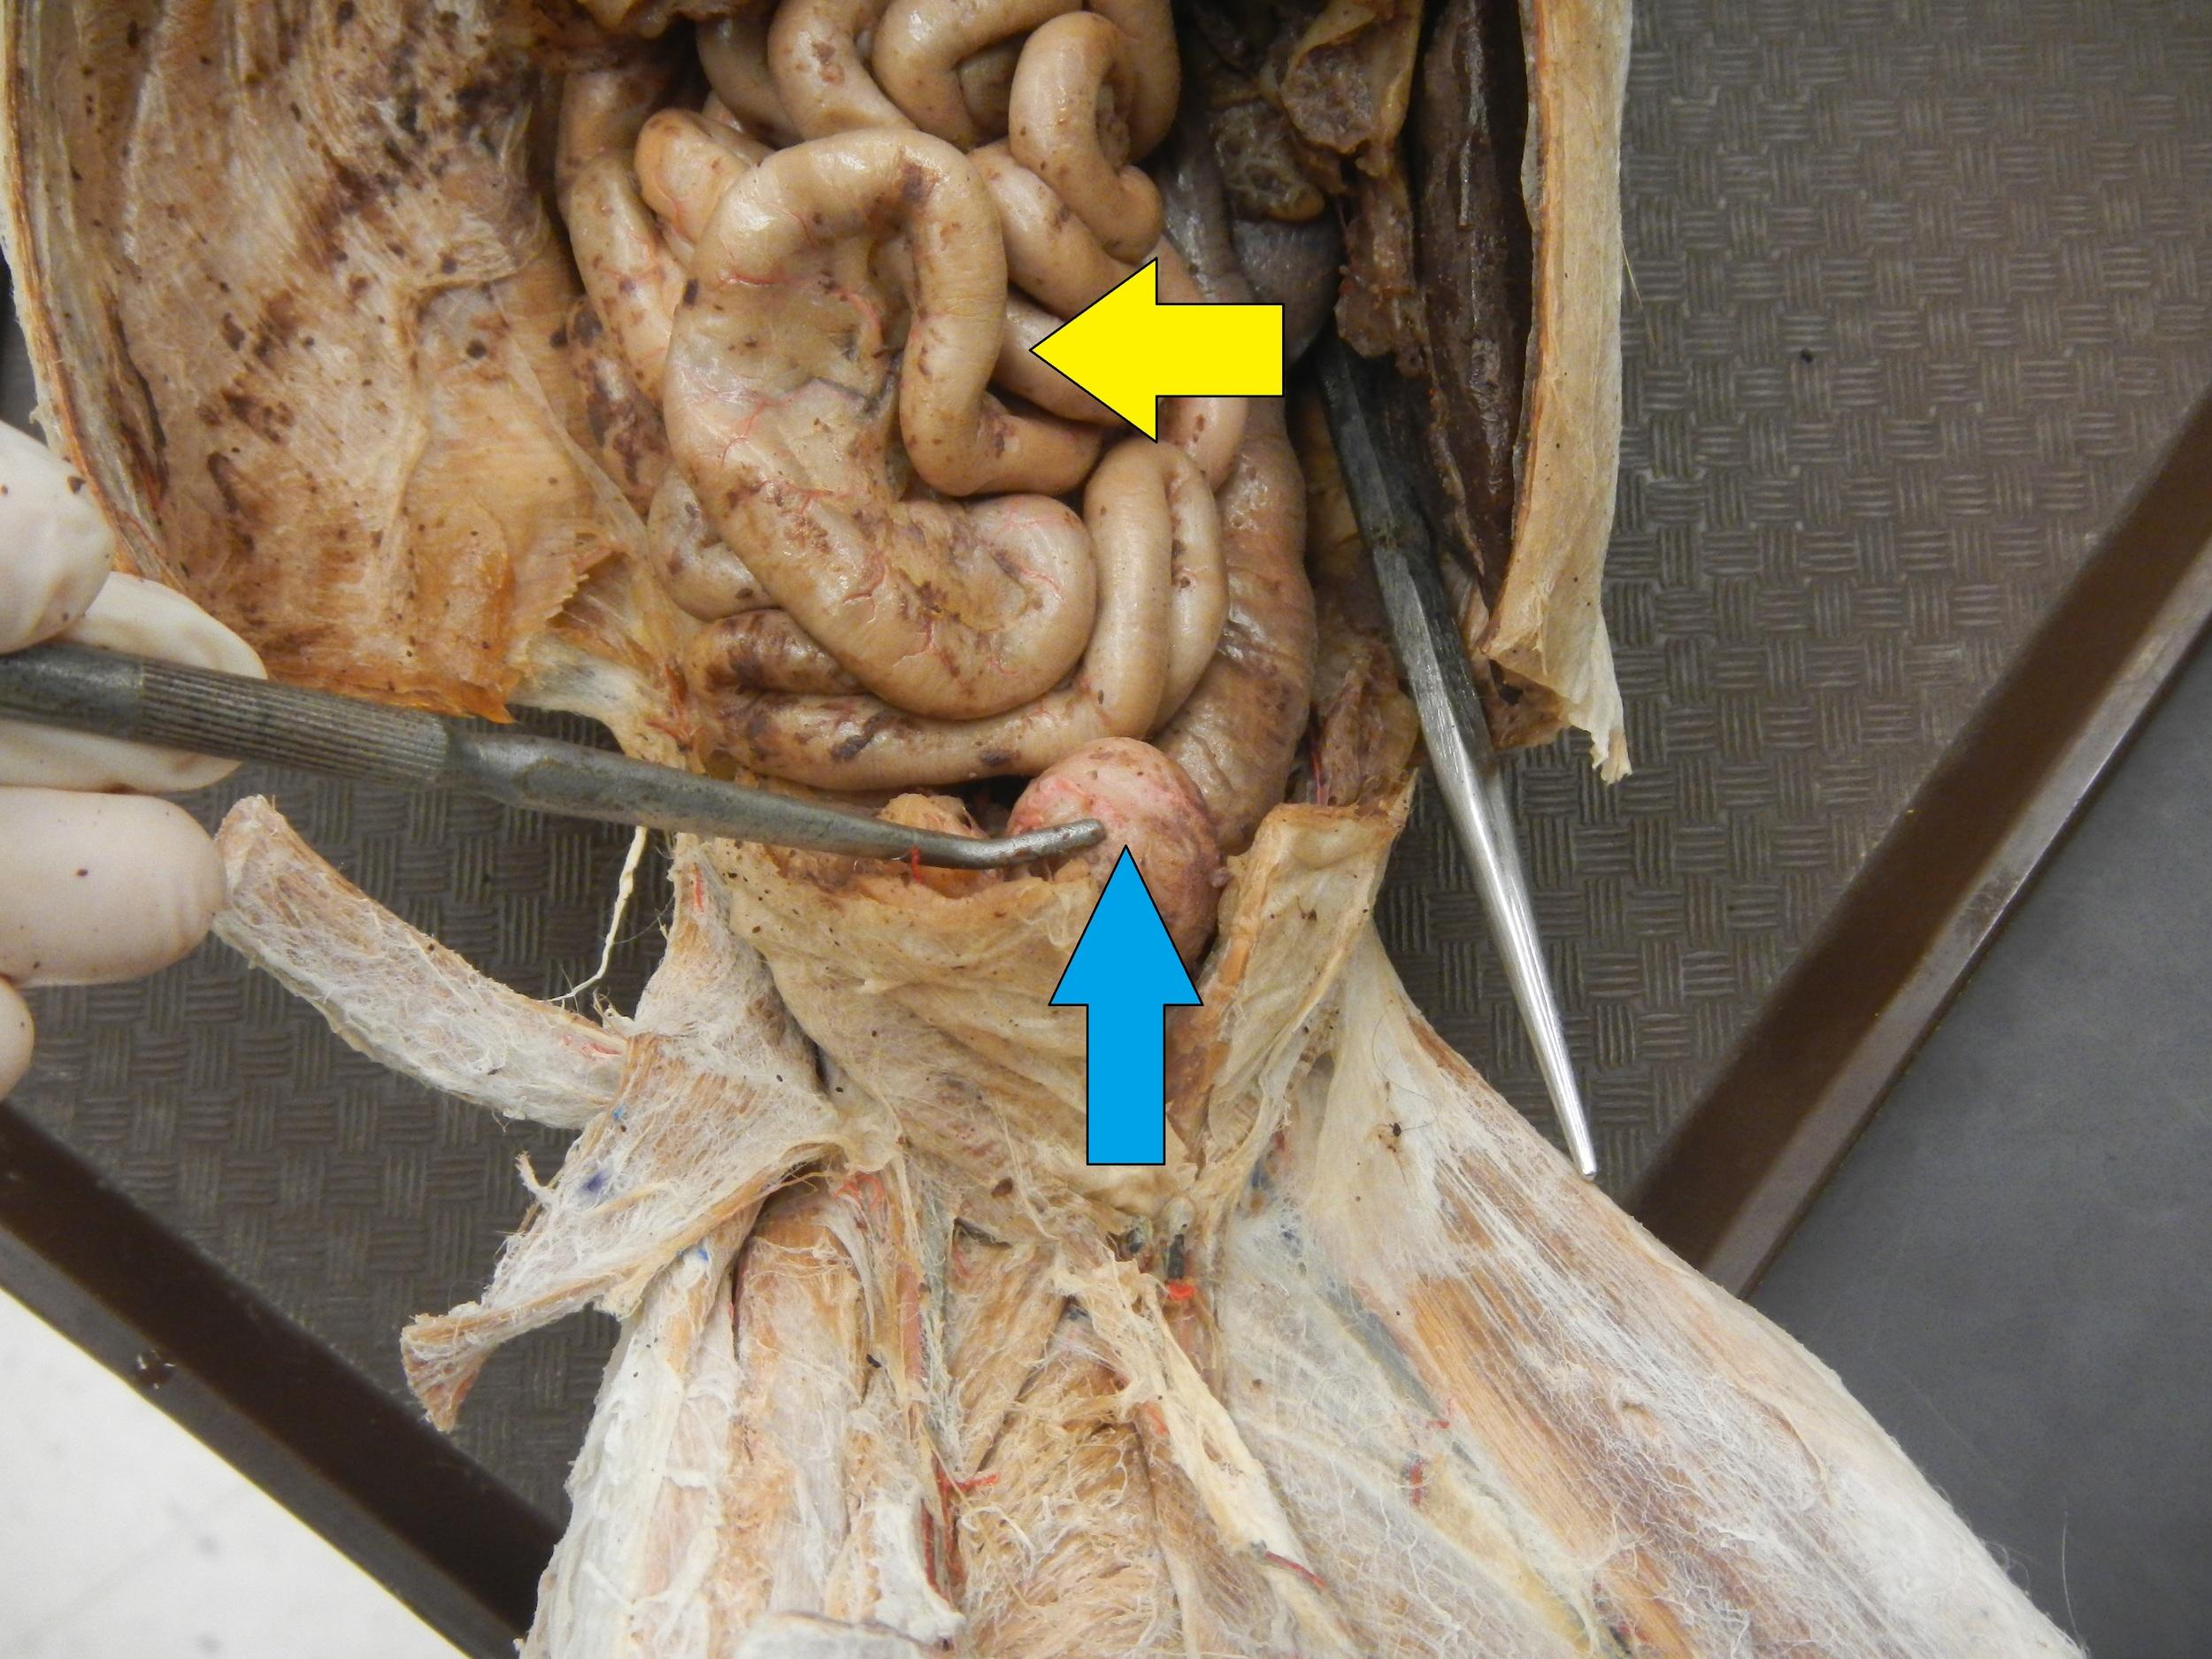 Blue - Urinary Bladder  Yellow - Small Intestine